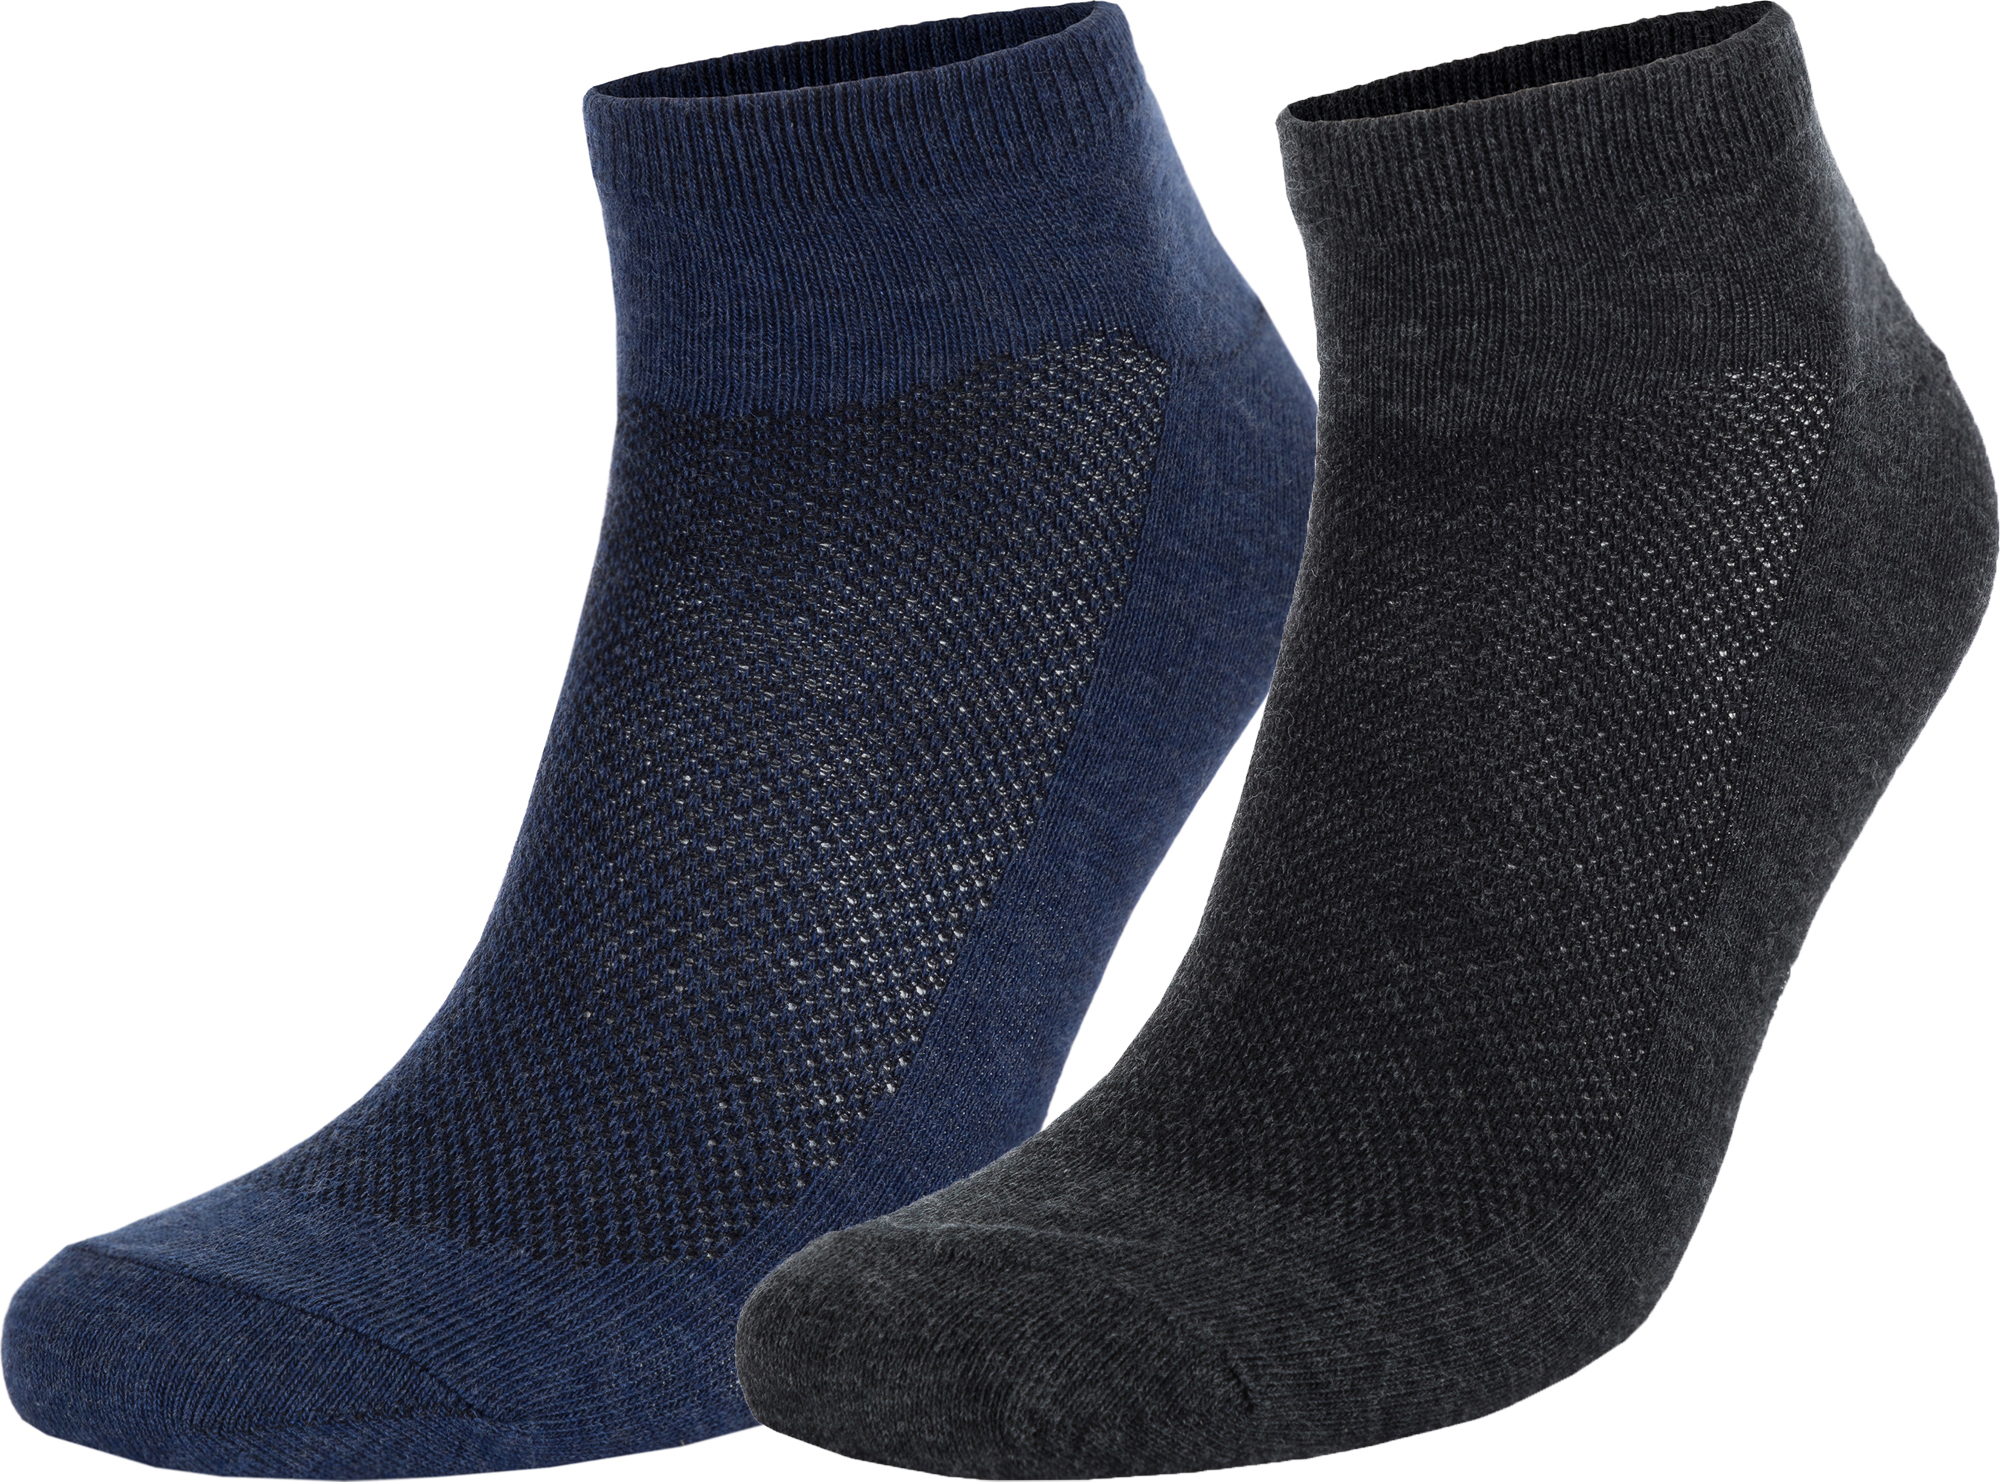 Wilson Носки мужские Wilson, 2 пары, размер 43-46 wilson носки мужские wilson premium 2 пары размер 35 38